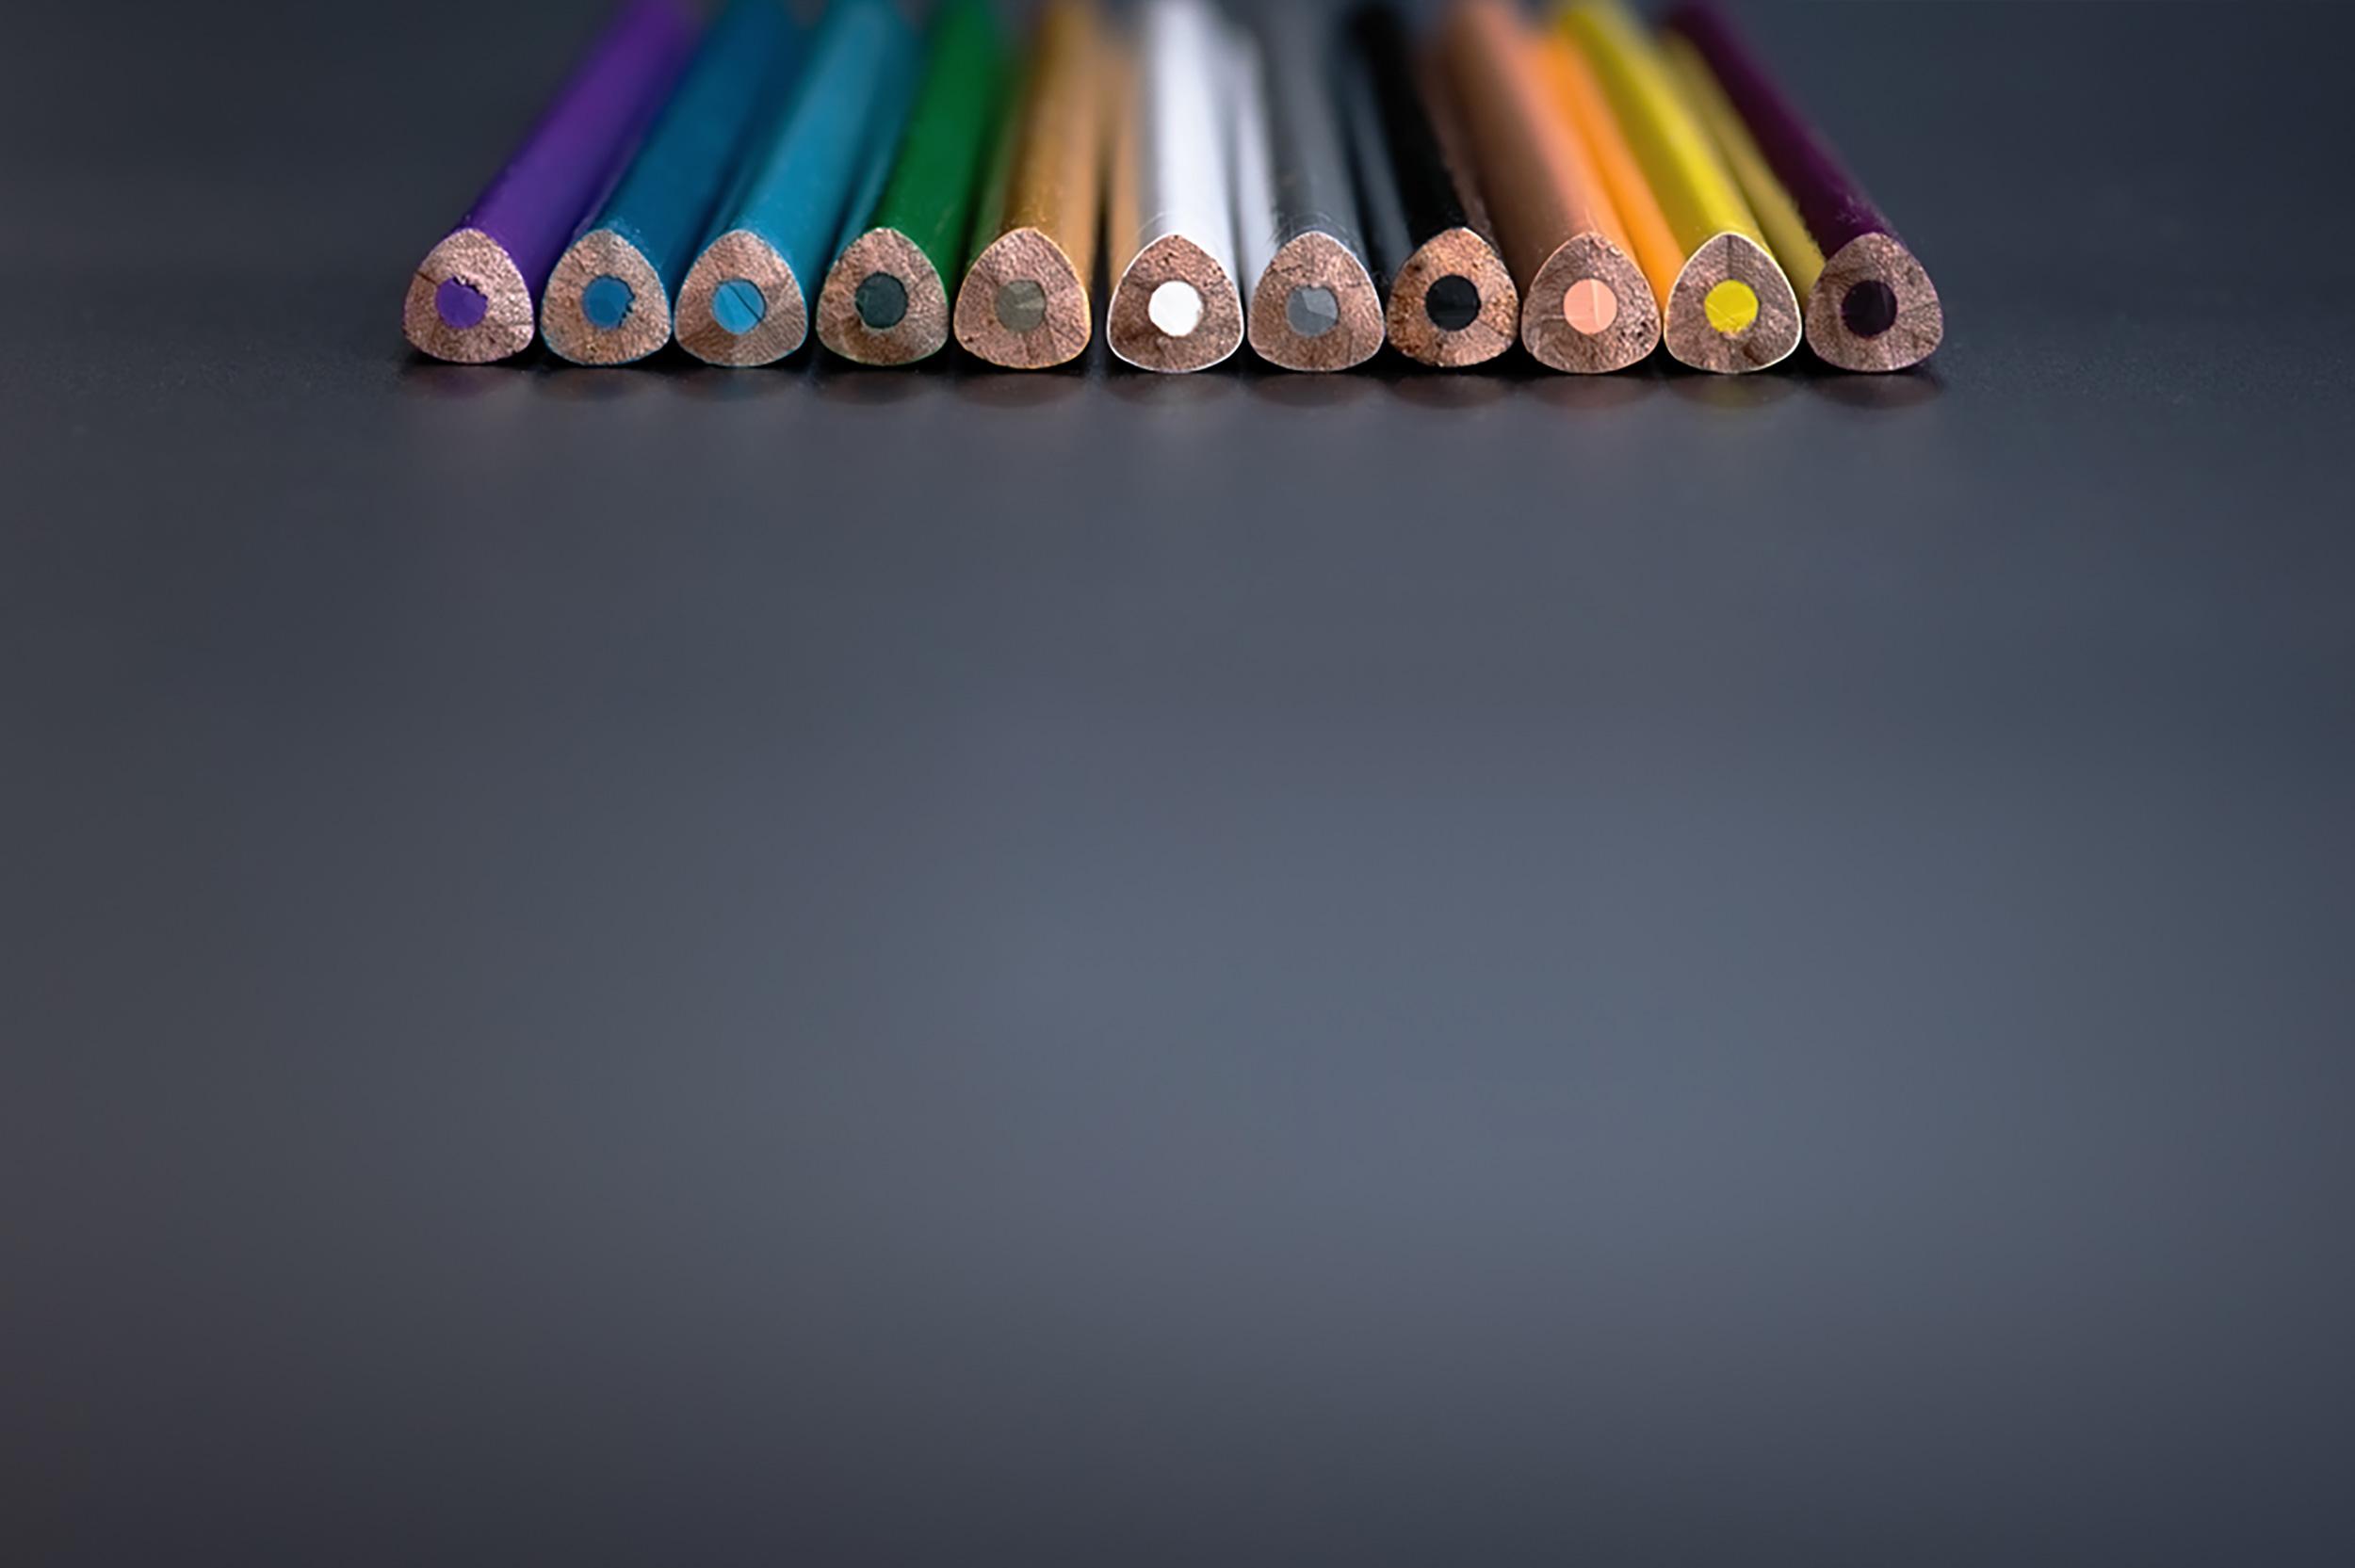 LokahiHereoImage-Pencils150dpi.jpg